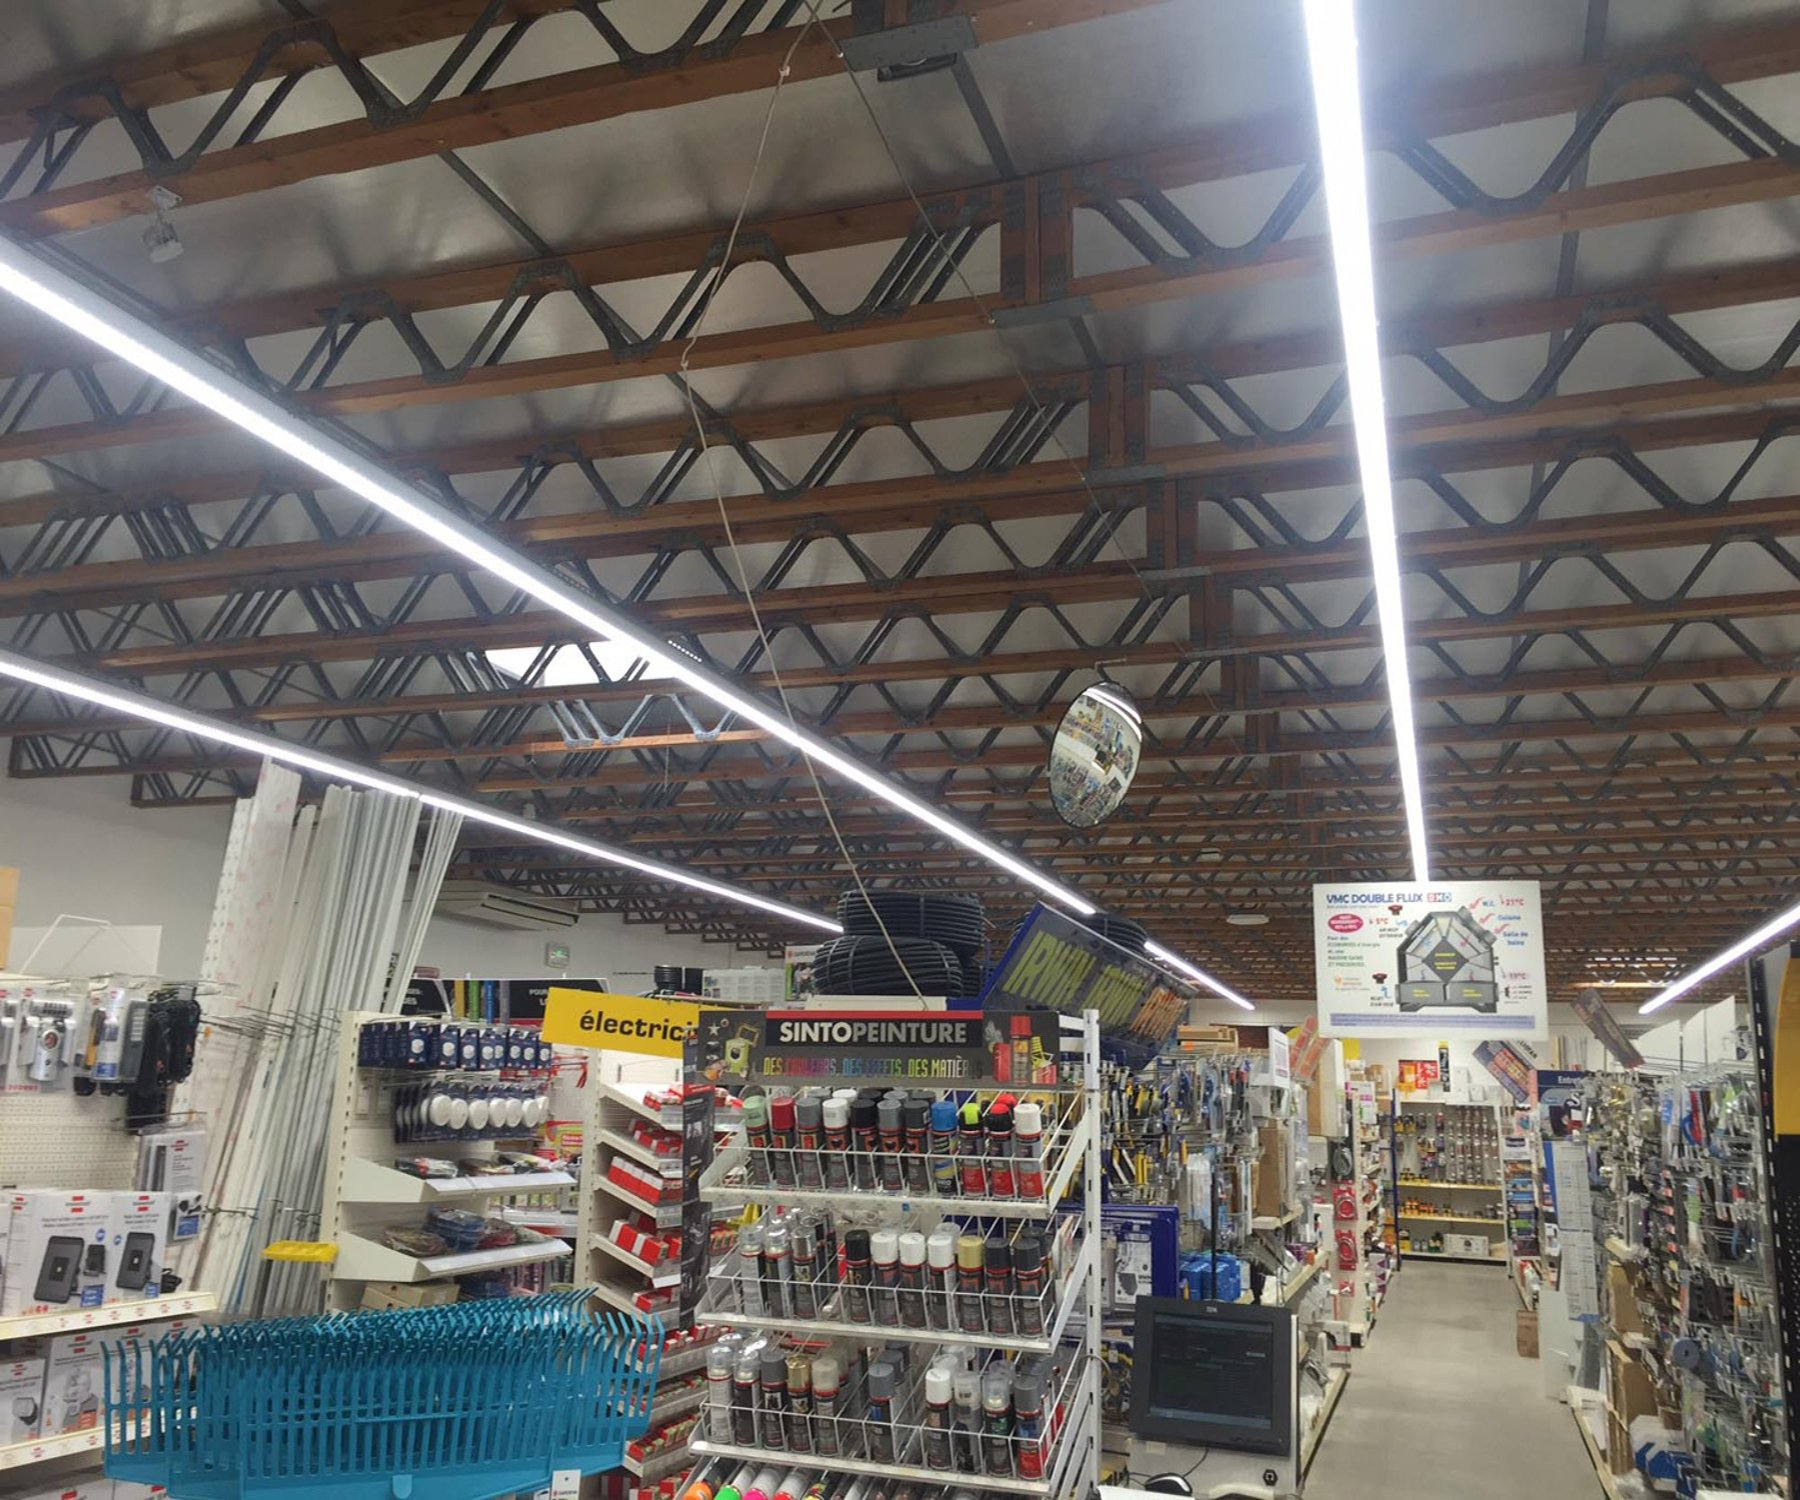 FaithSail 8FT LED Strip Lights Linkable Linear LED Shop